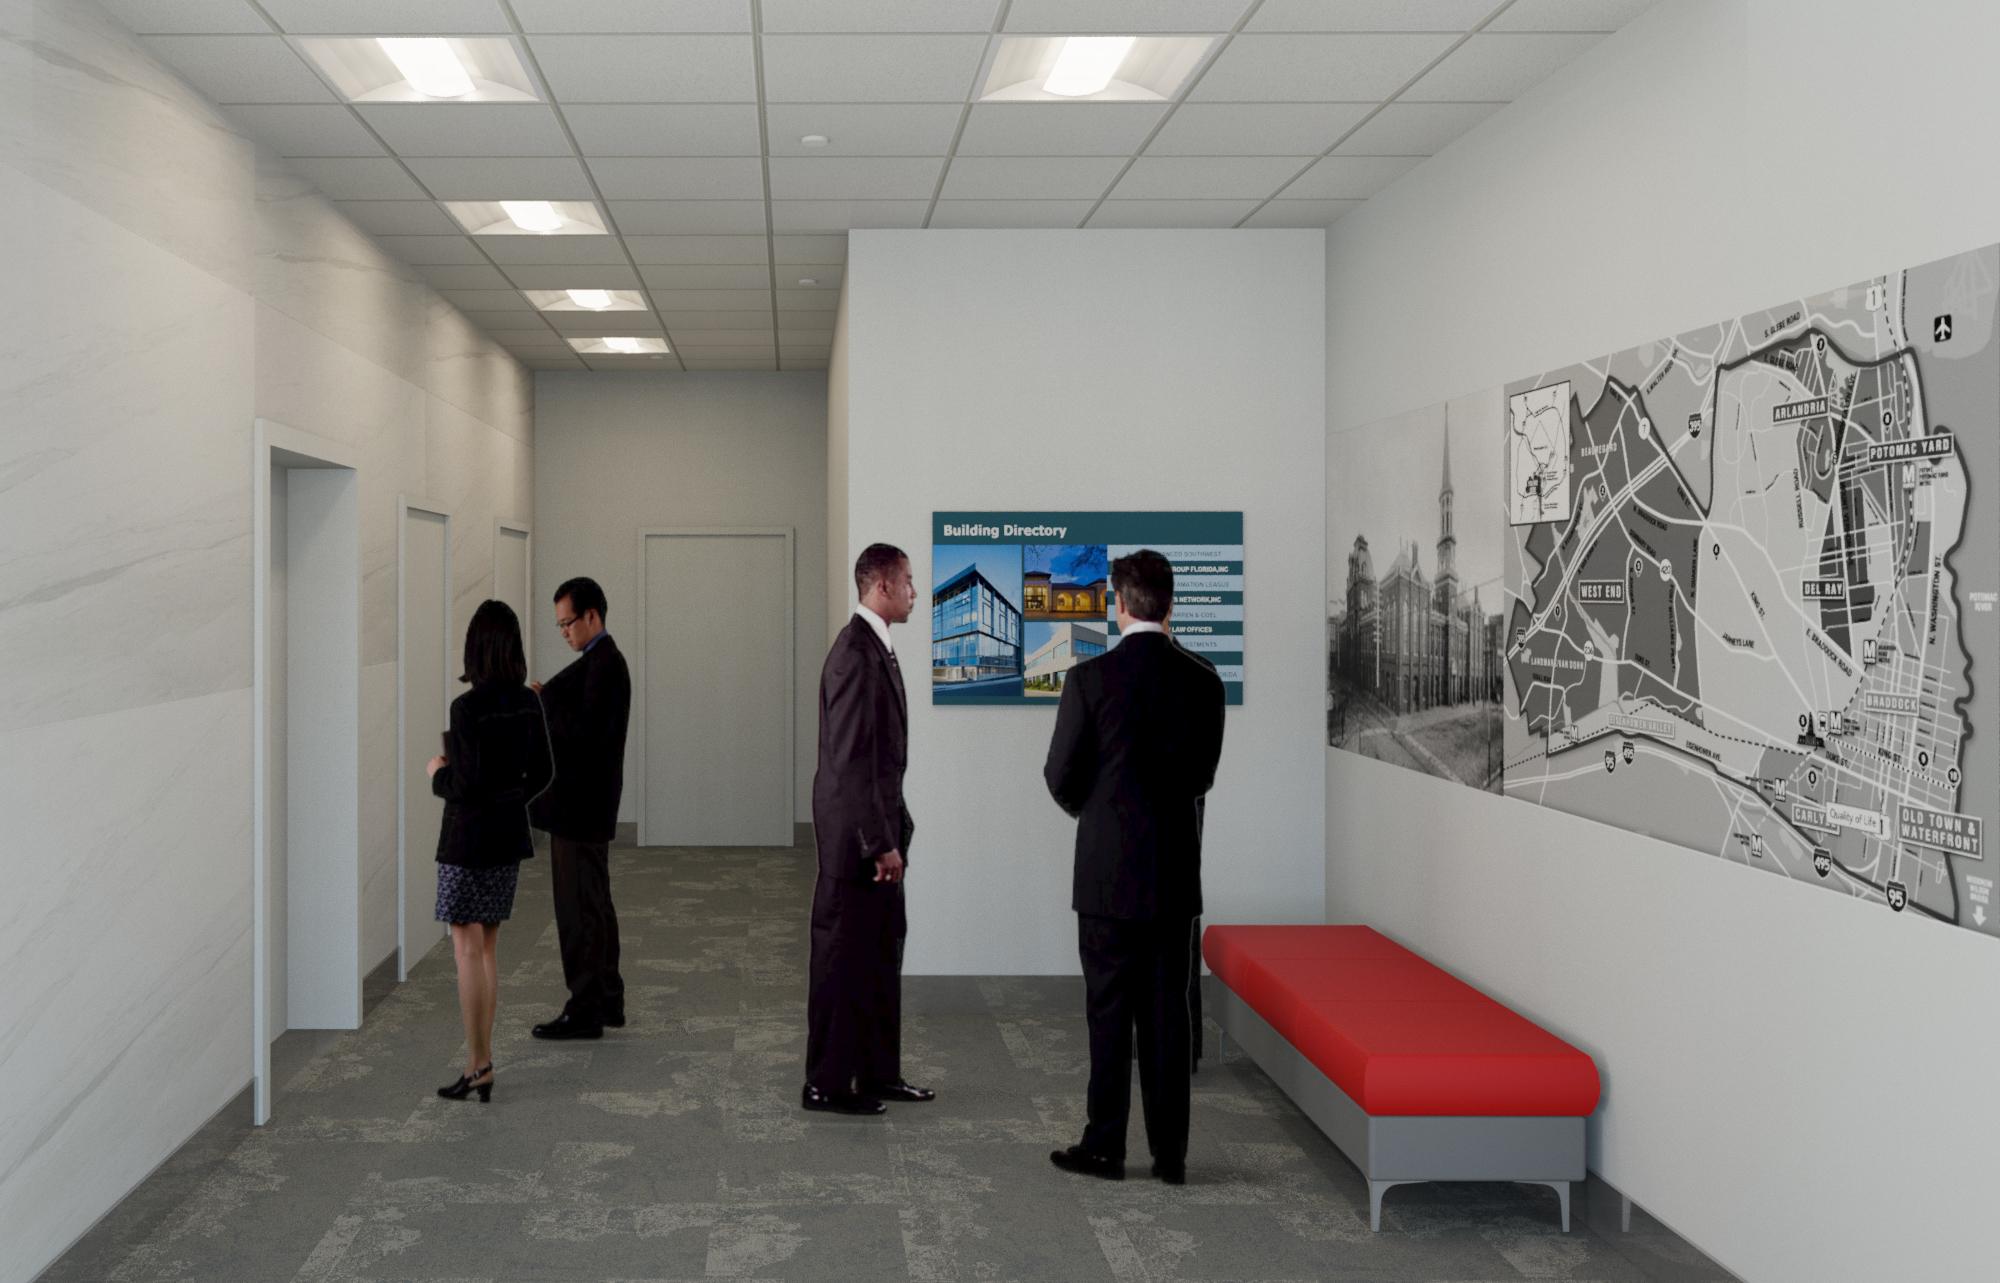 lower elevator lobby